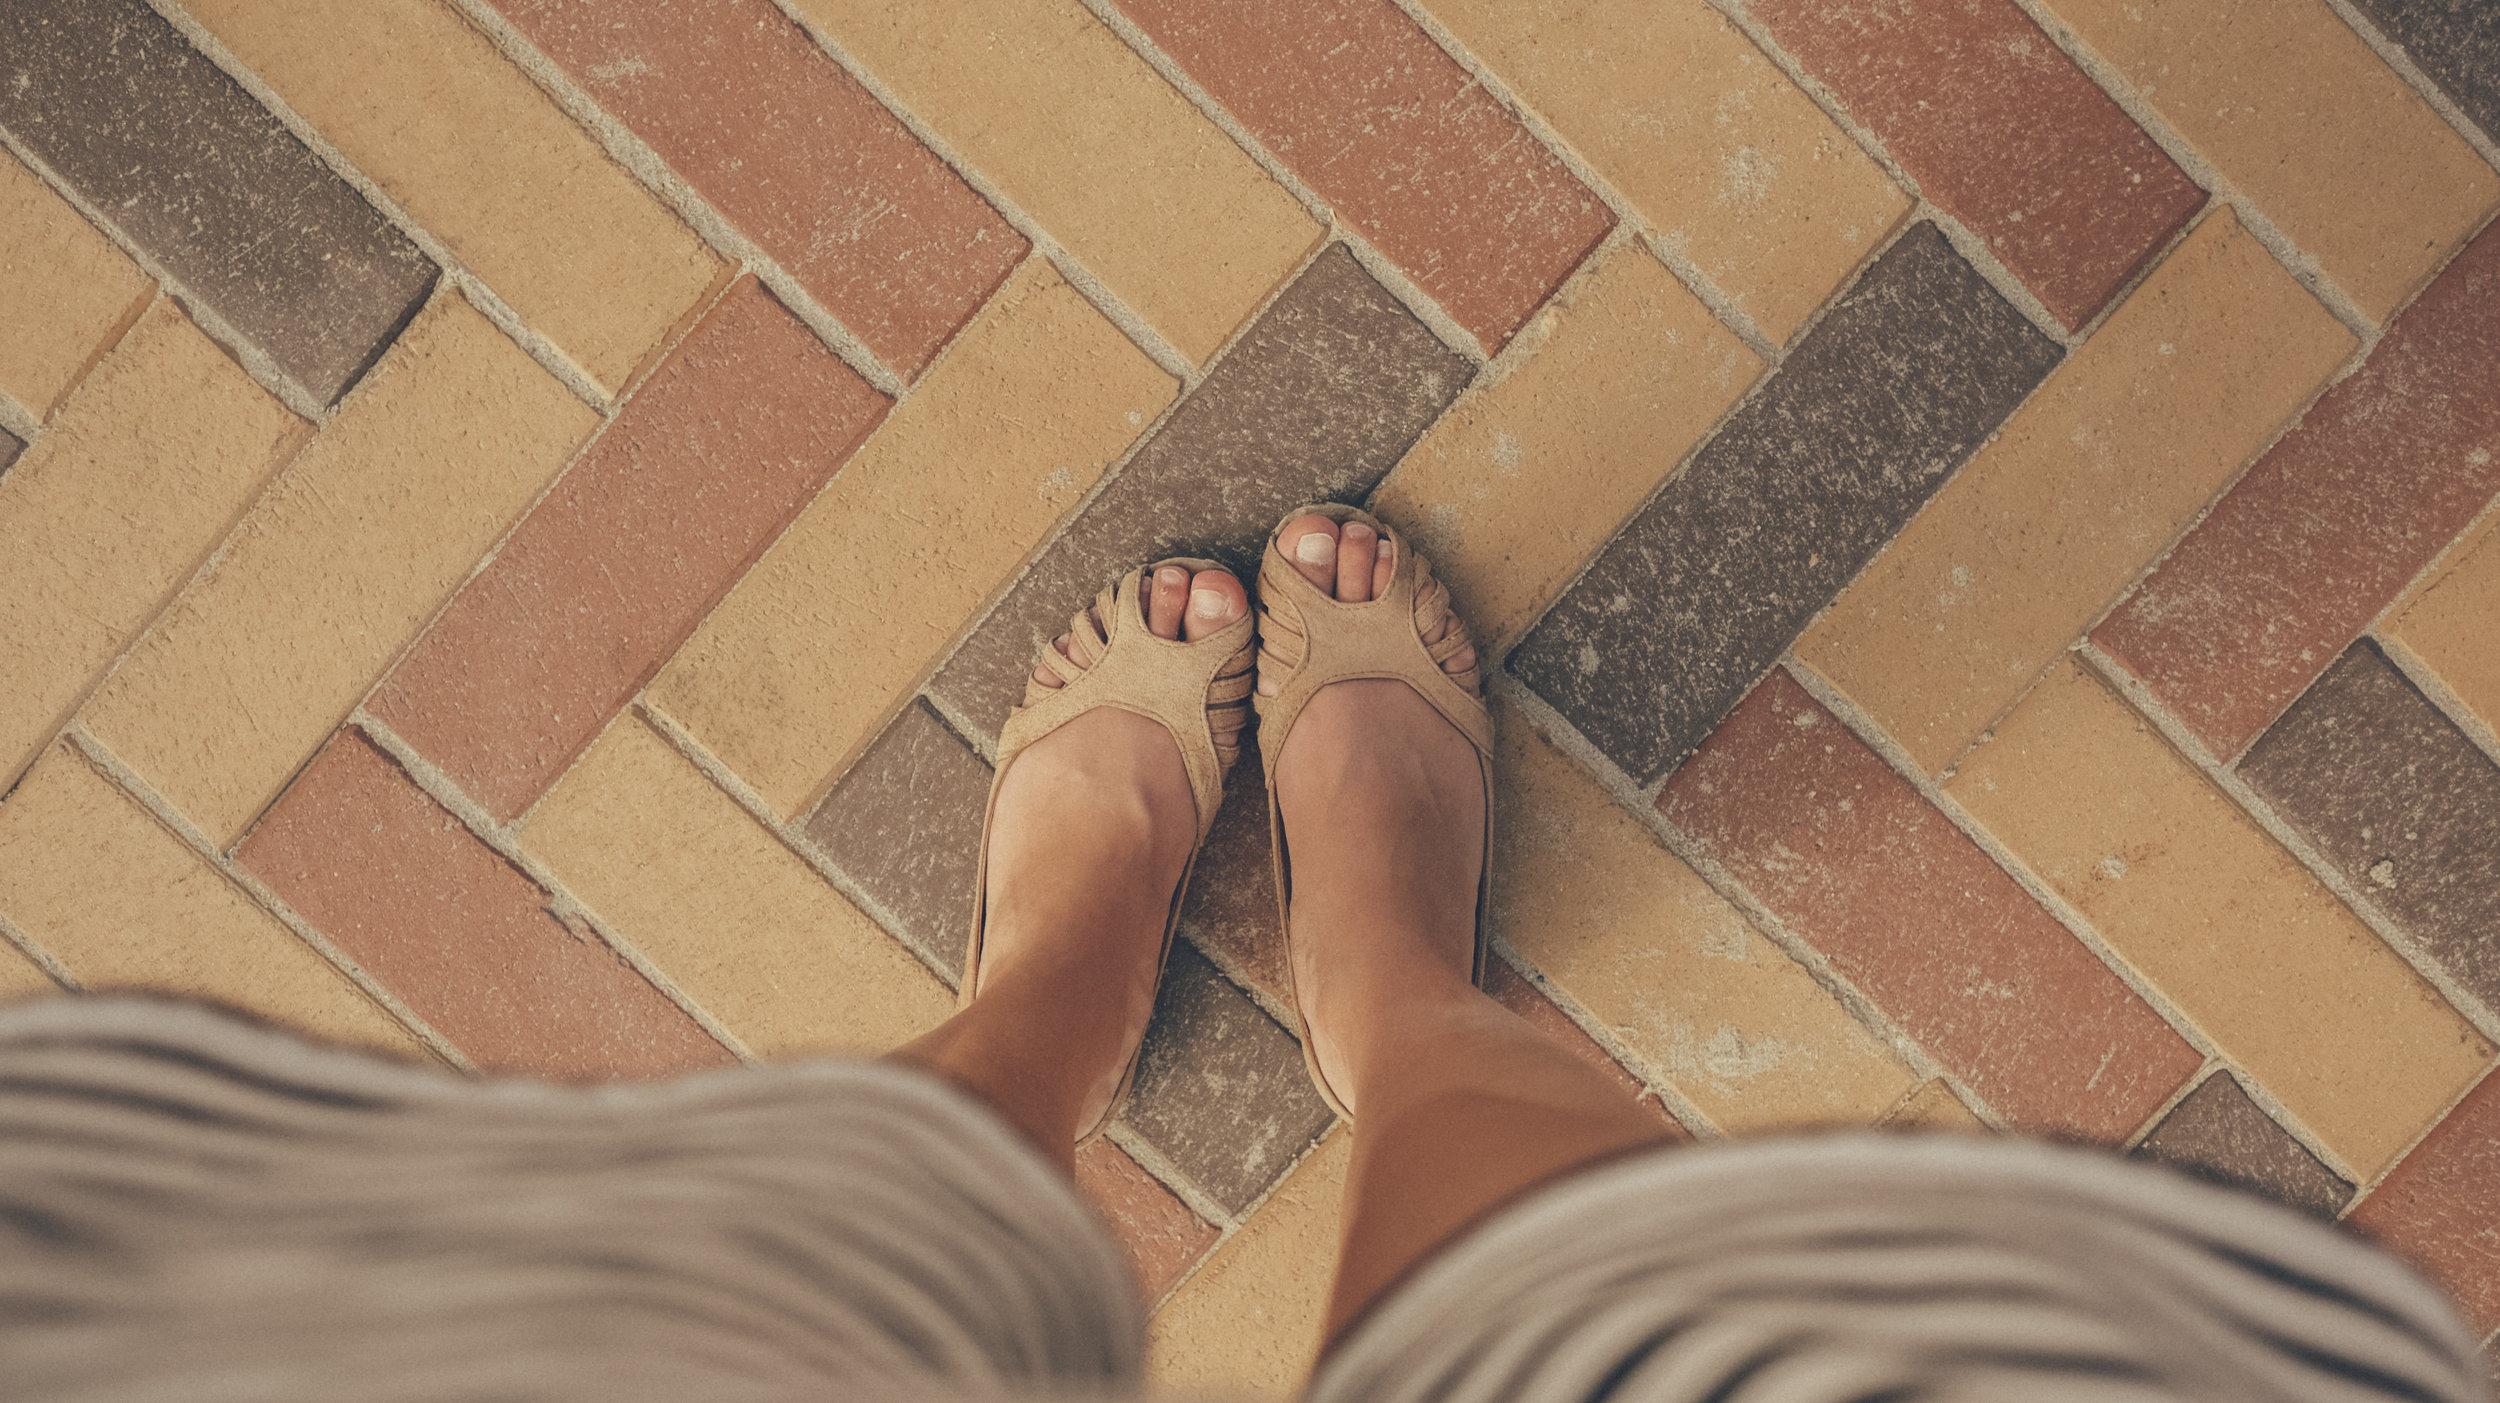 Wenduine DeHaan NorthSea Travel Blogger Tips11.jpg